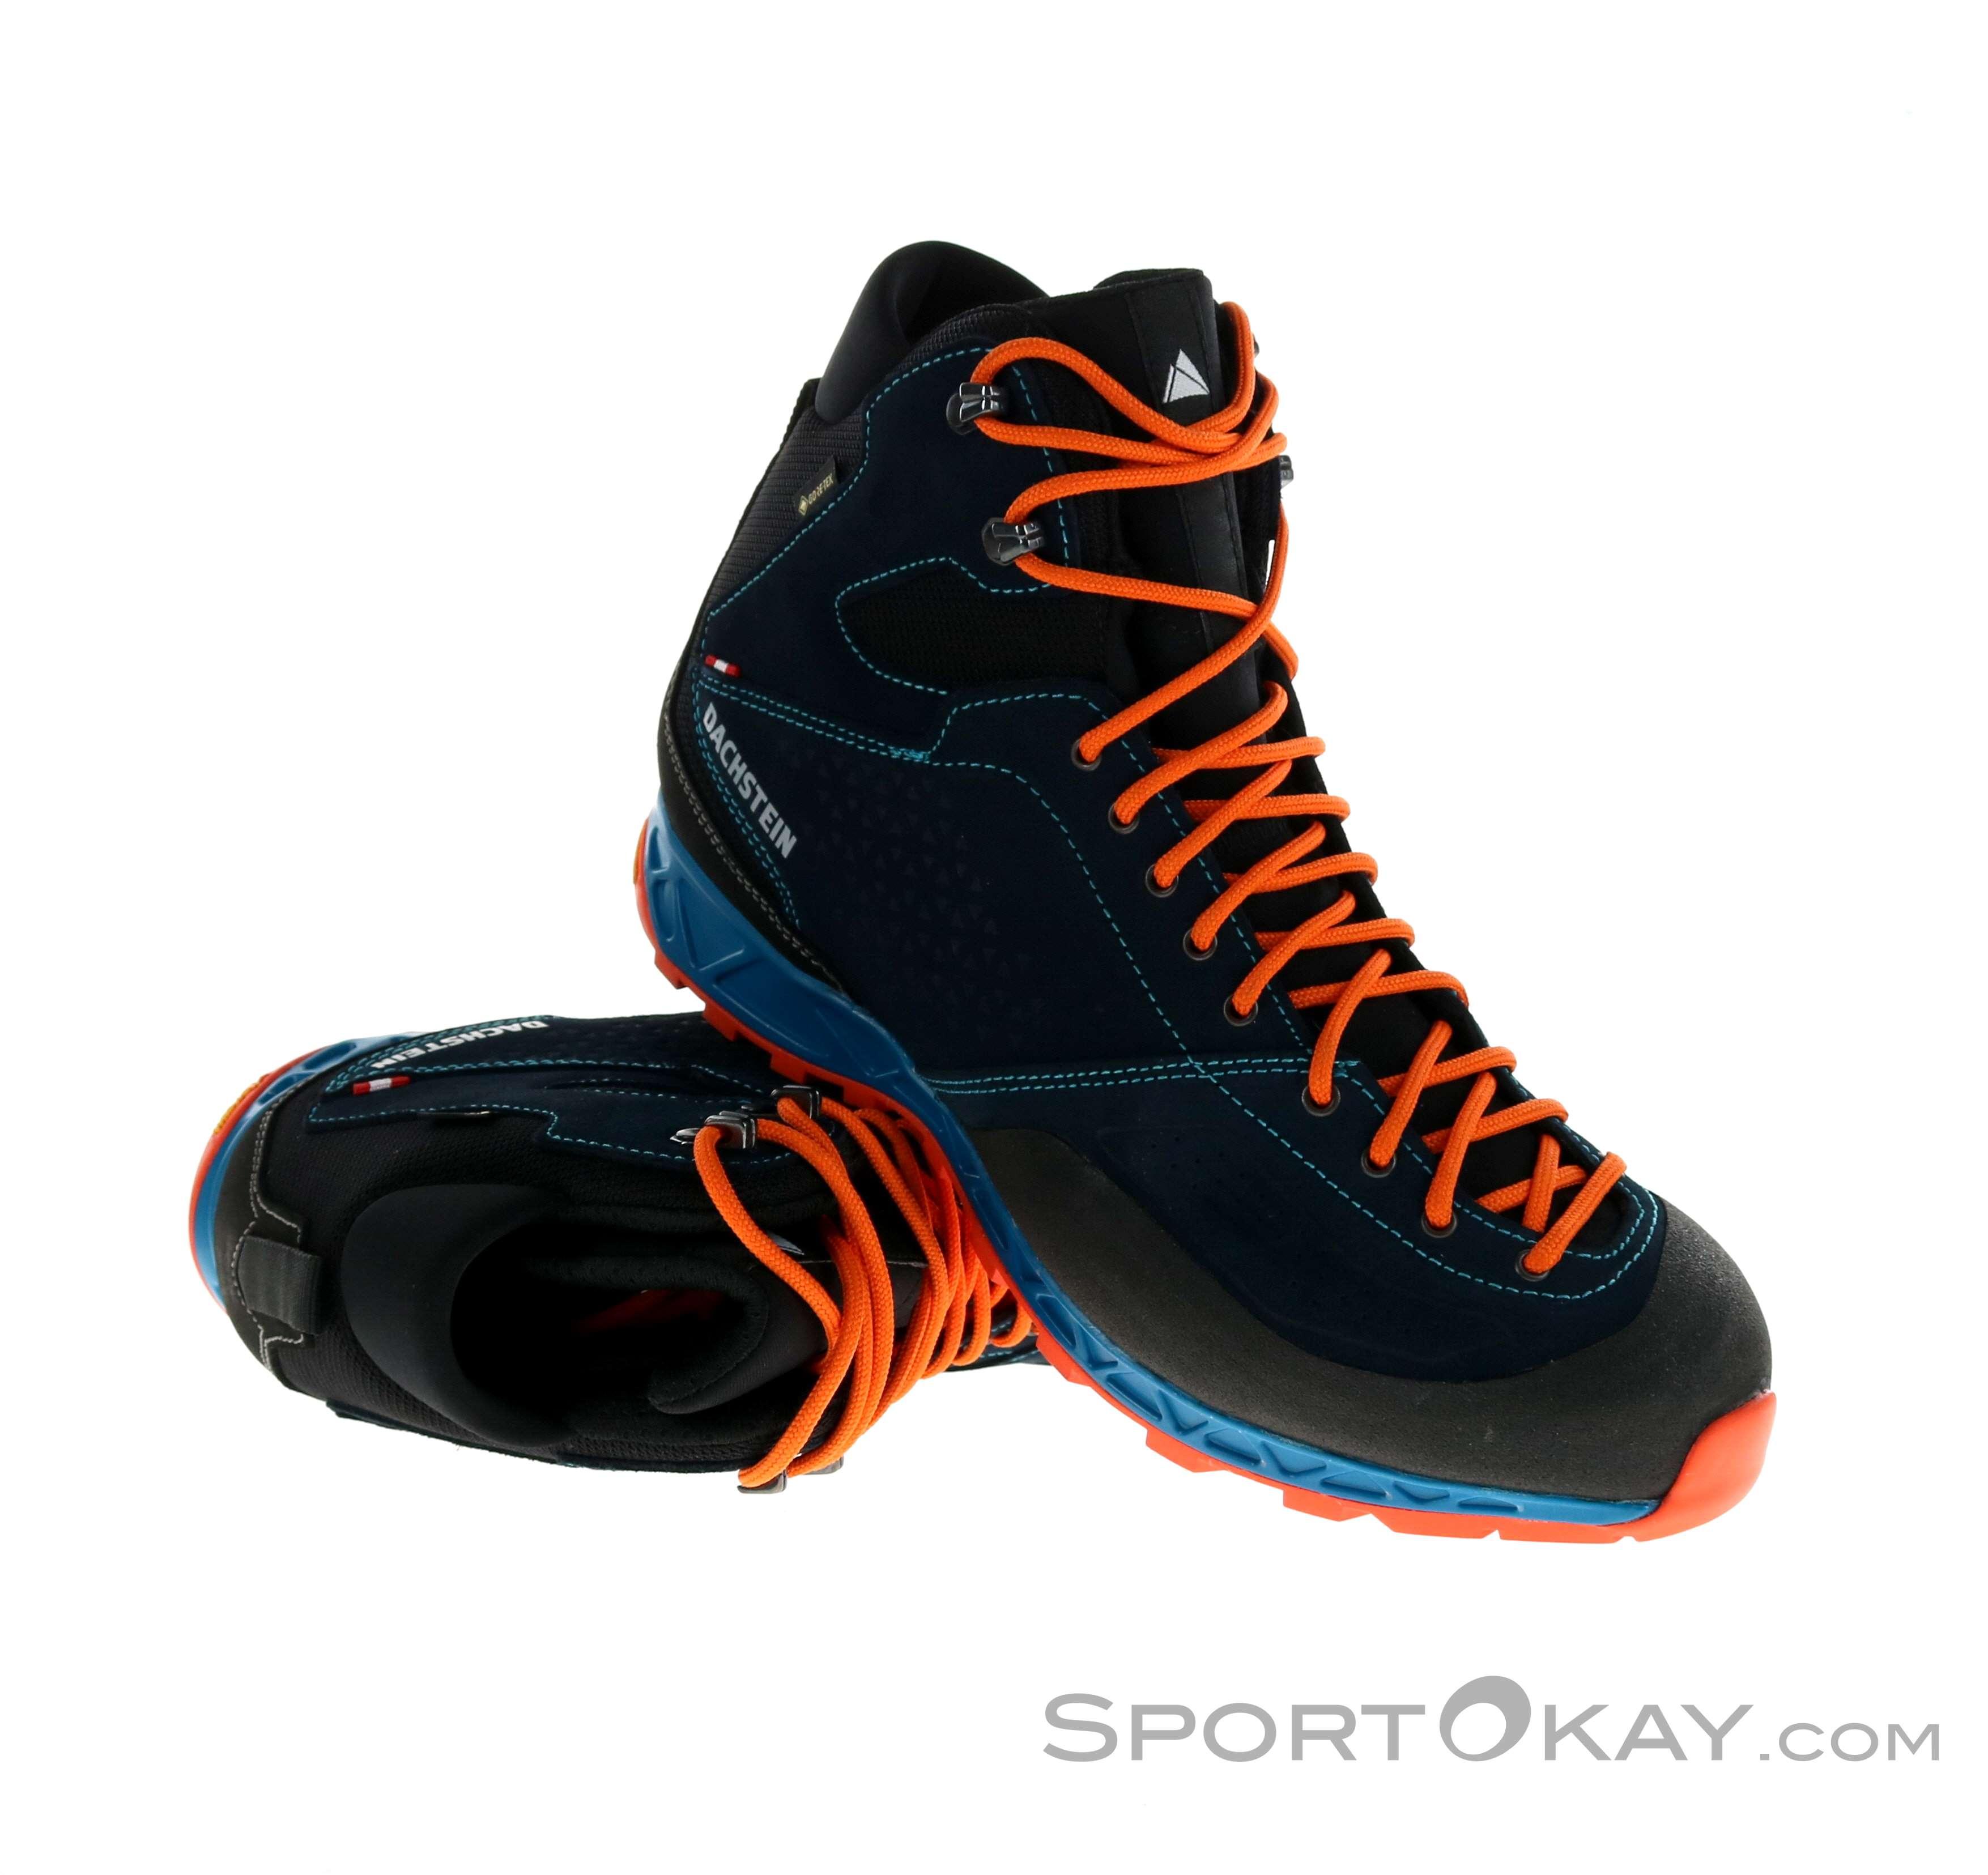 Dachstein Dachstein Super Ferrata MC GTX Mens Mountaineering Boots